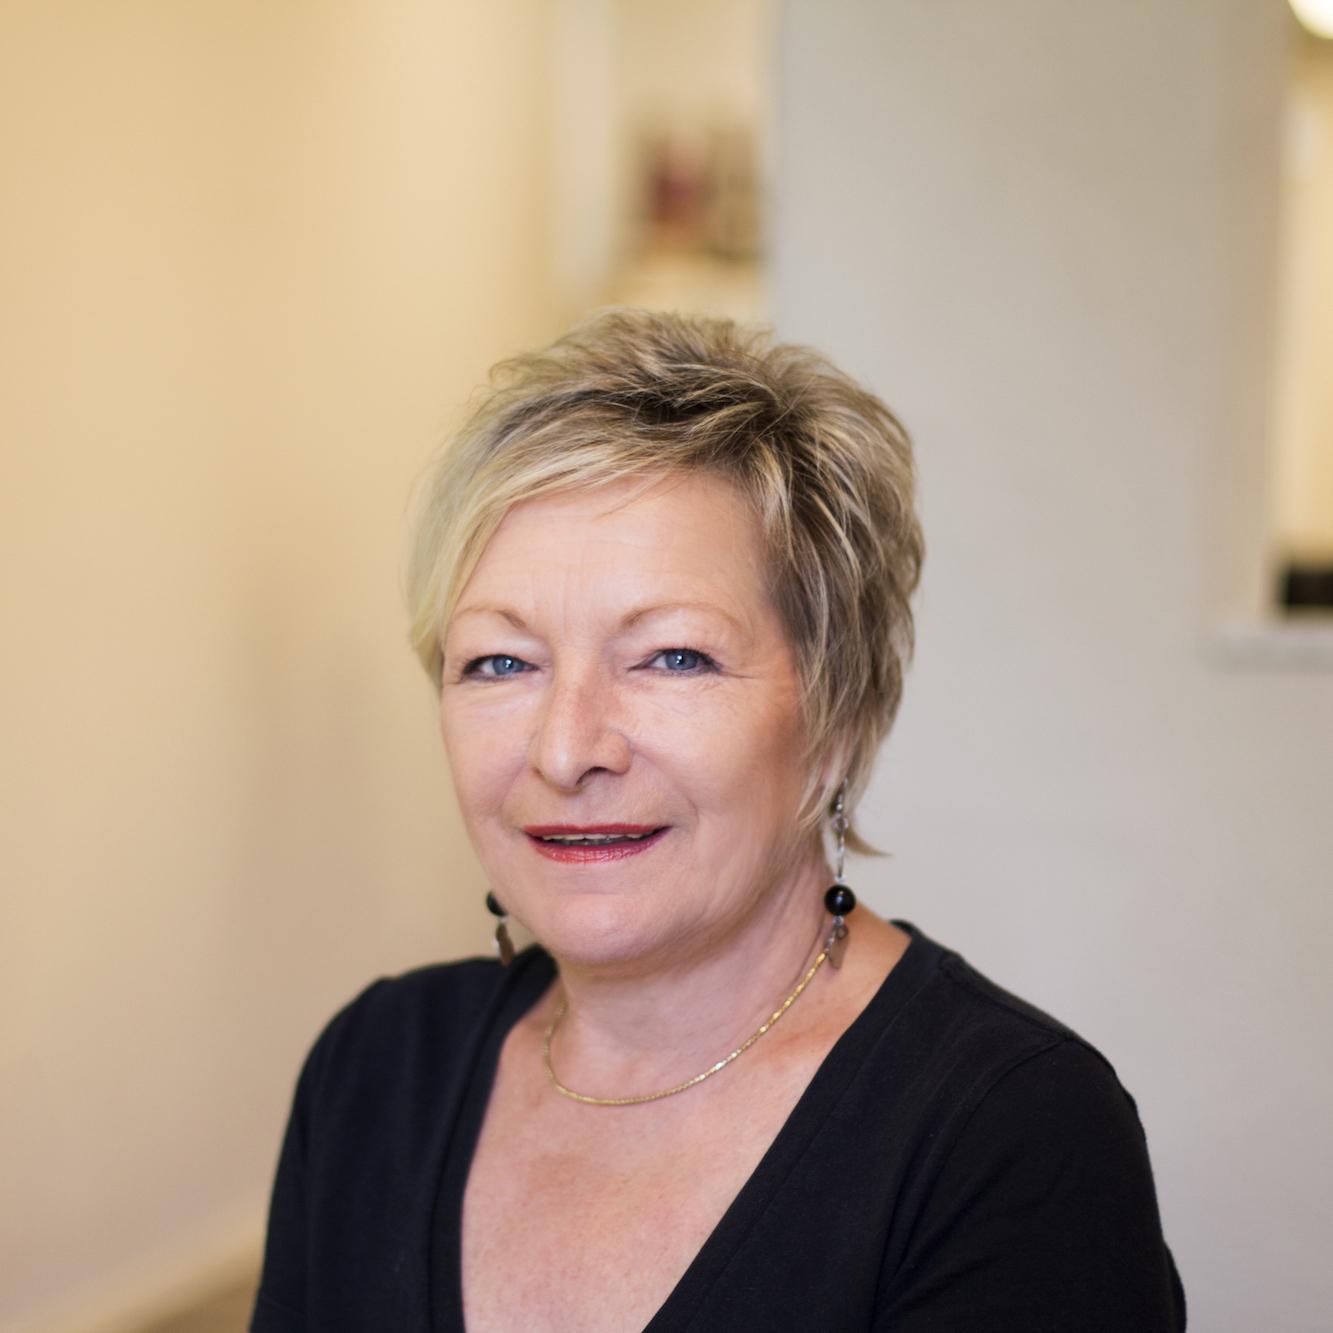 Barbara Mugrauer